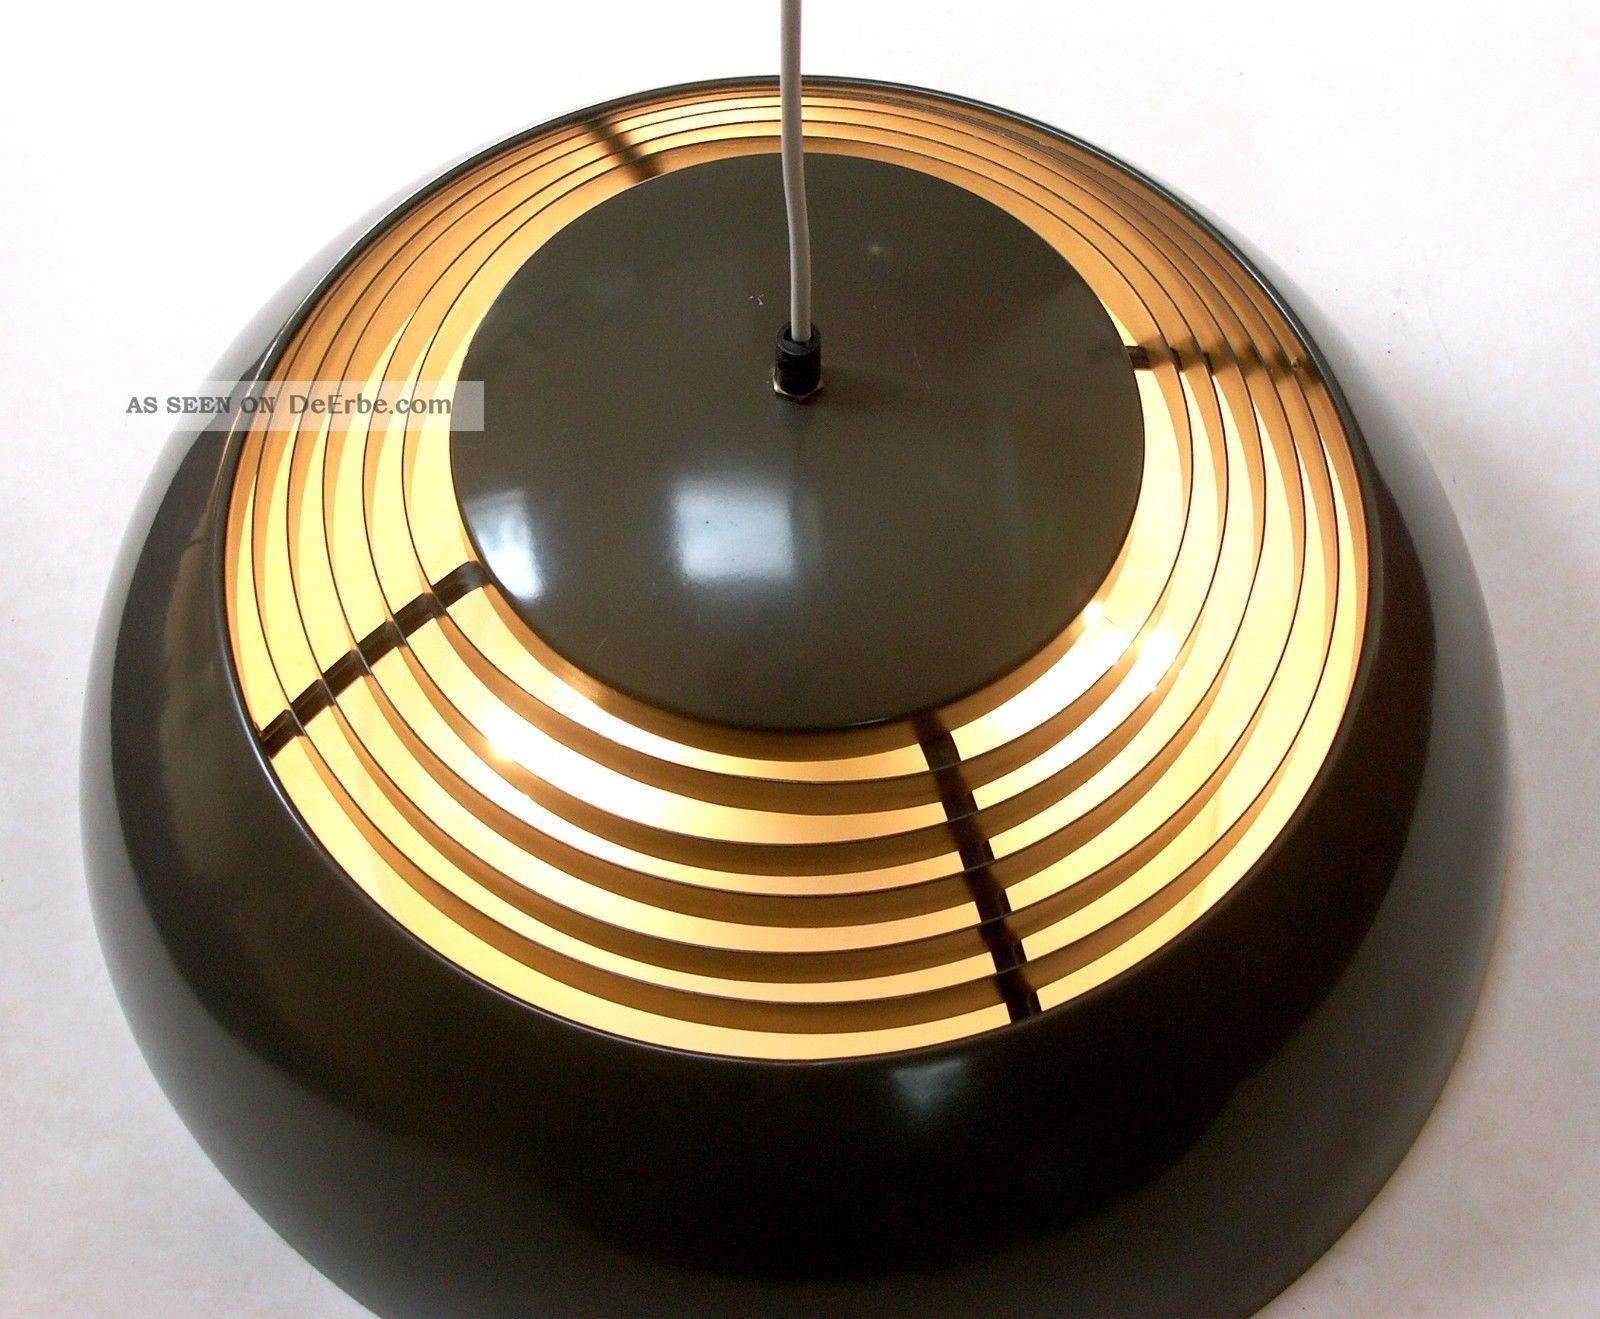 aj royal h ngelampe arne jacobsen louis poulsen 50 cm pendant lamp. Black Bedroom Furniture Sets. Home Design Ideas